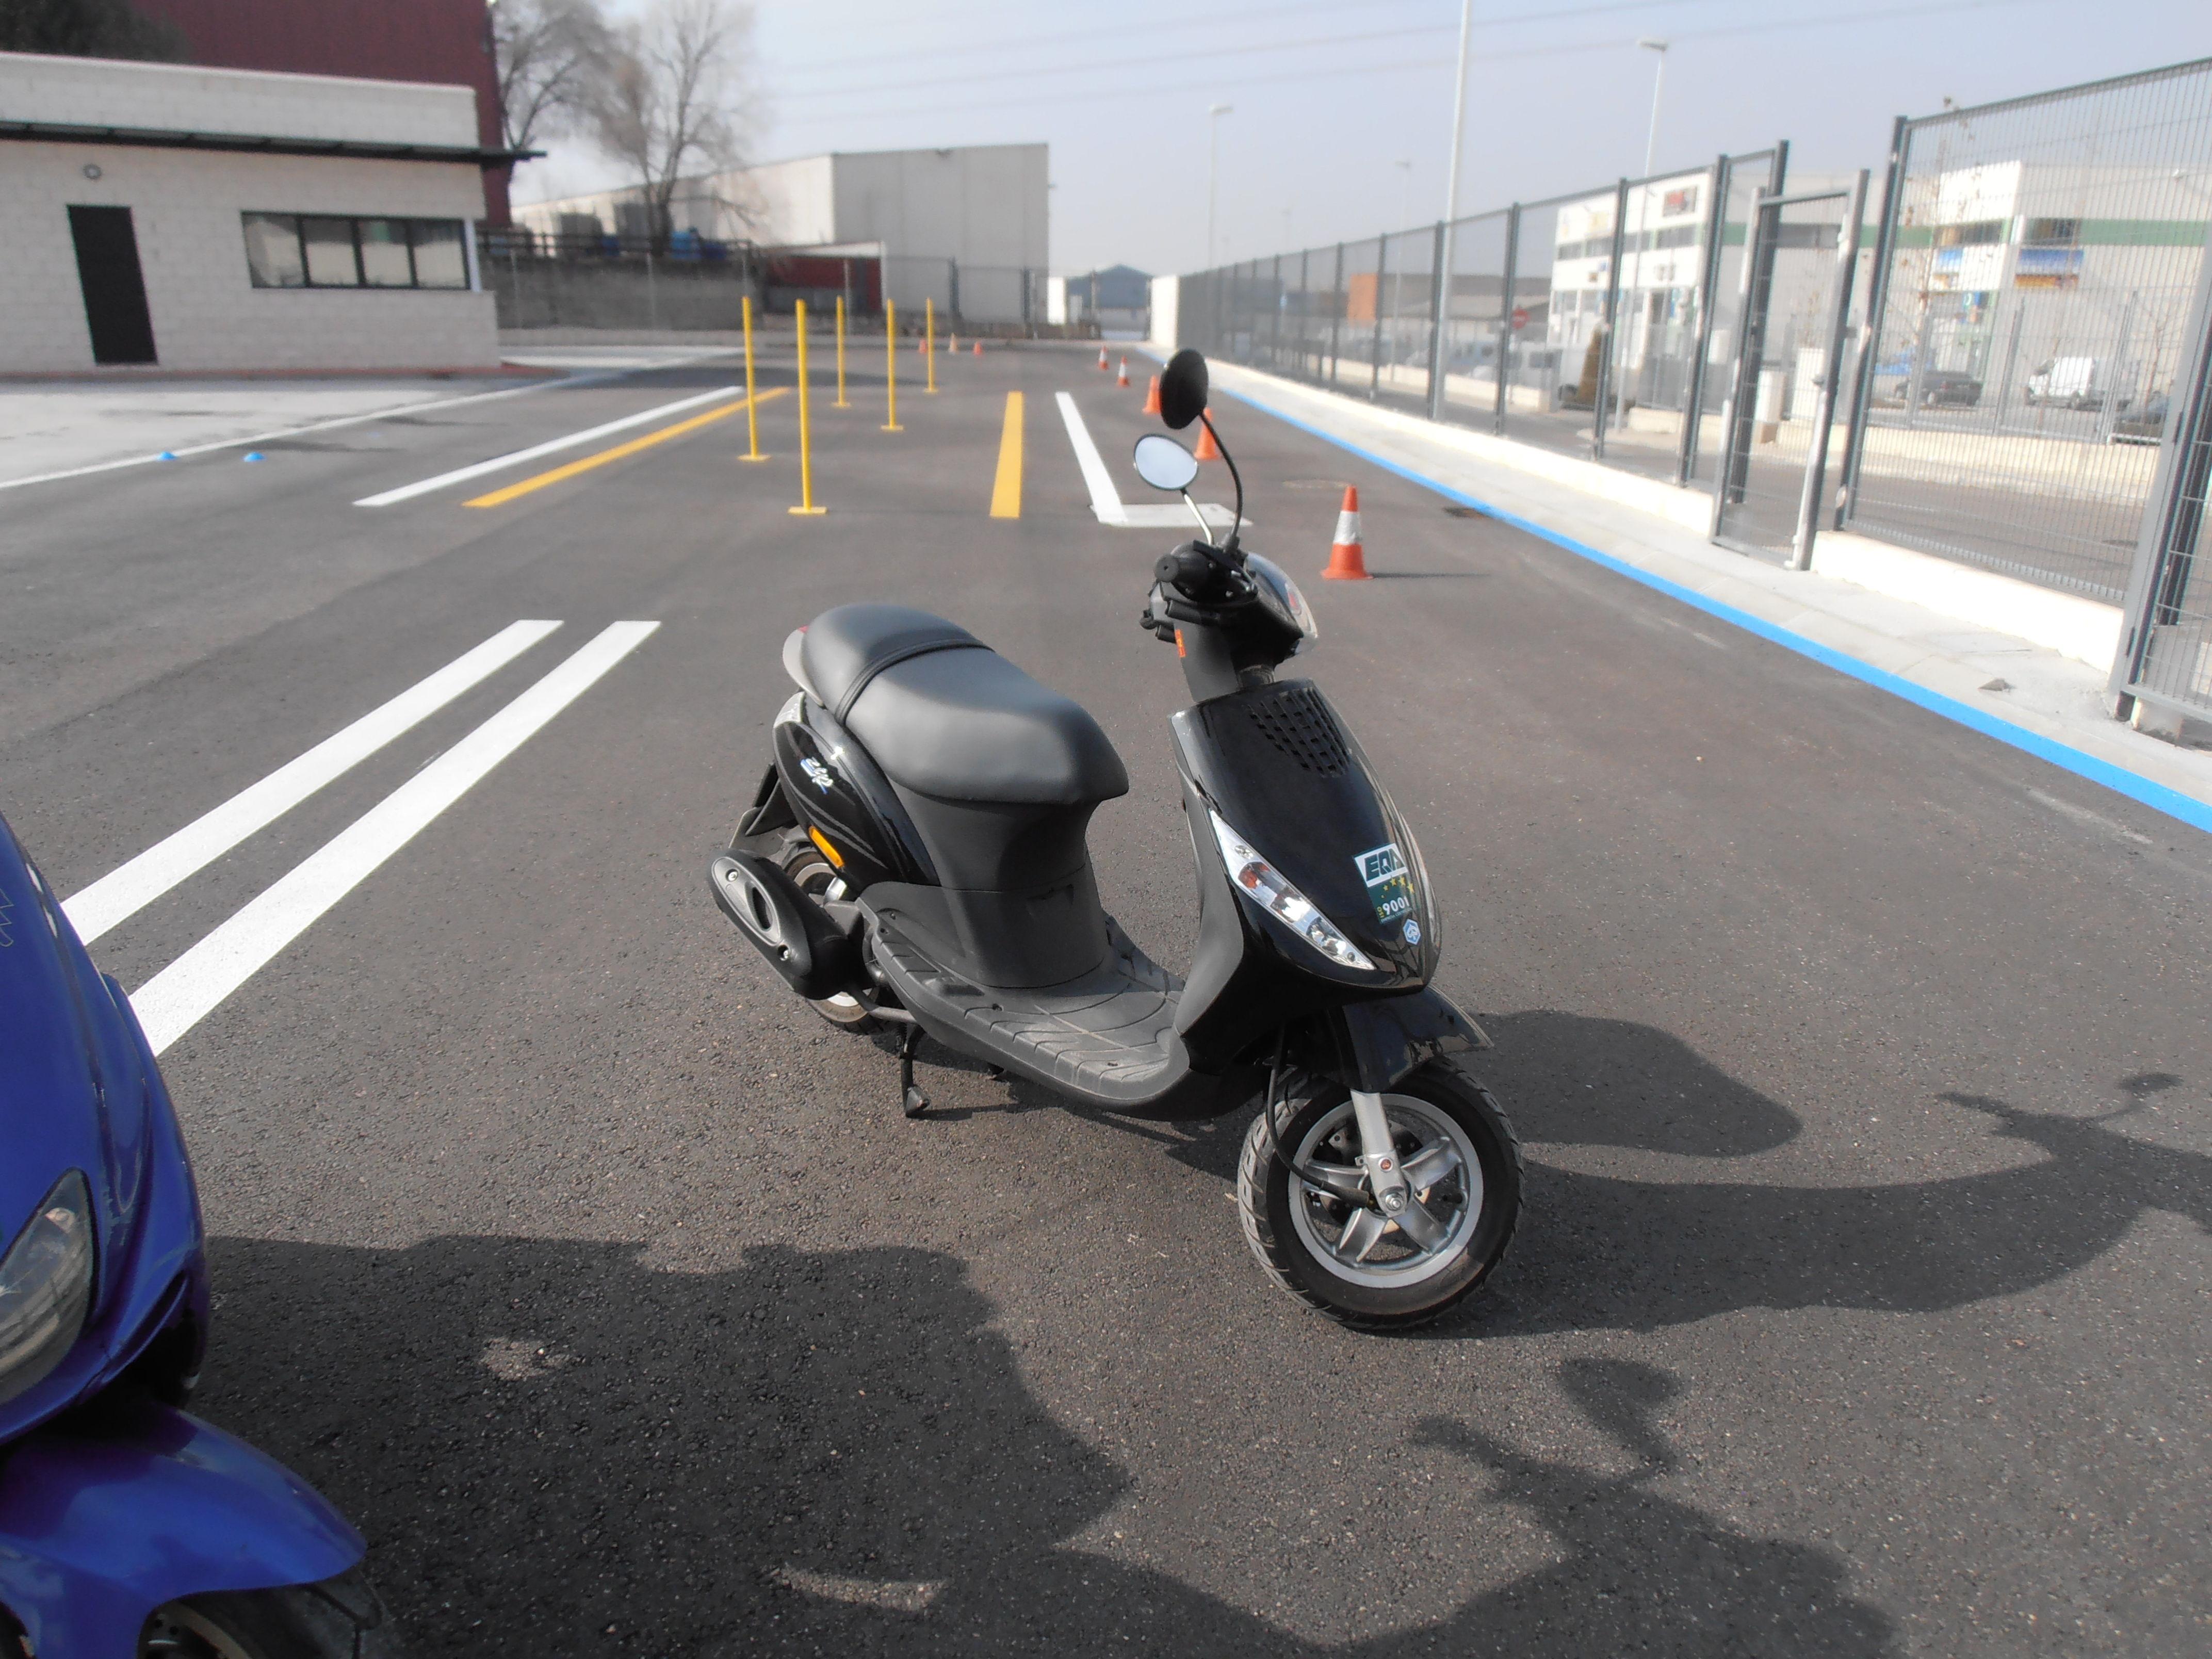 PIAGGIO ZIP 50 cc. - PERMISO AM